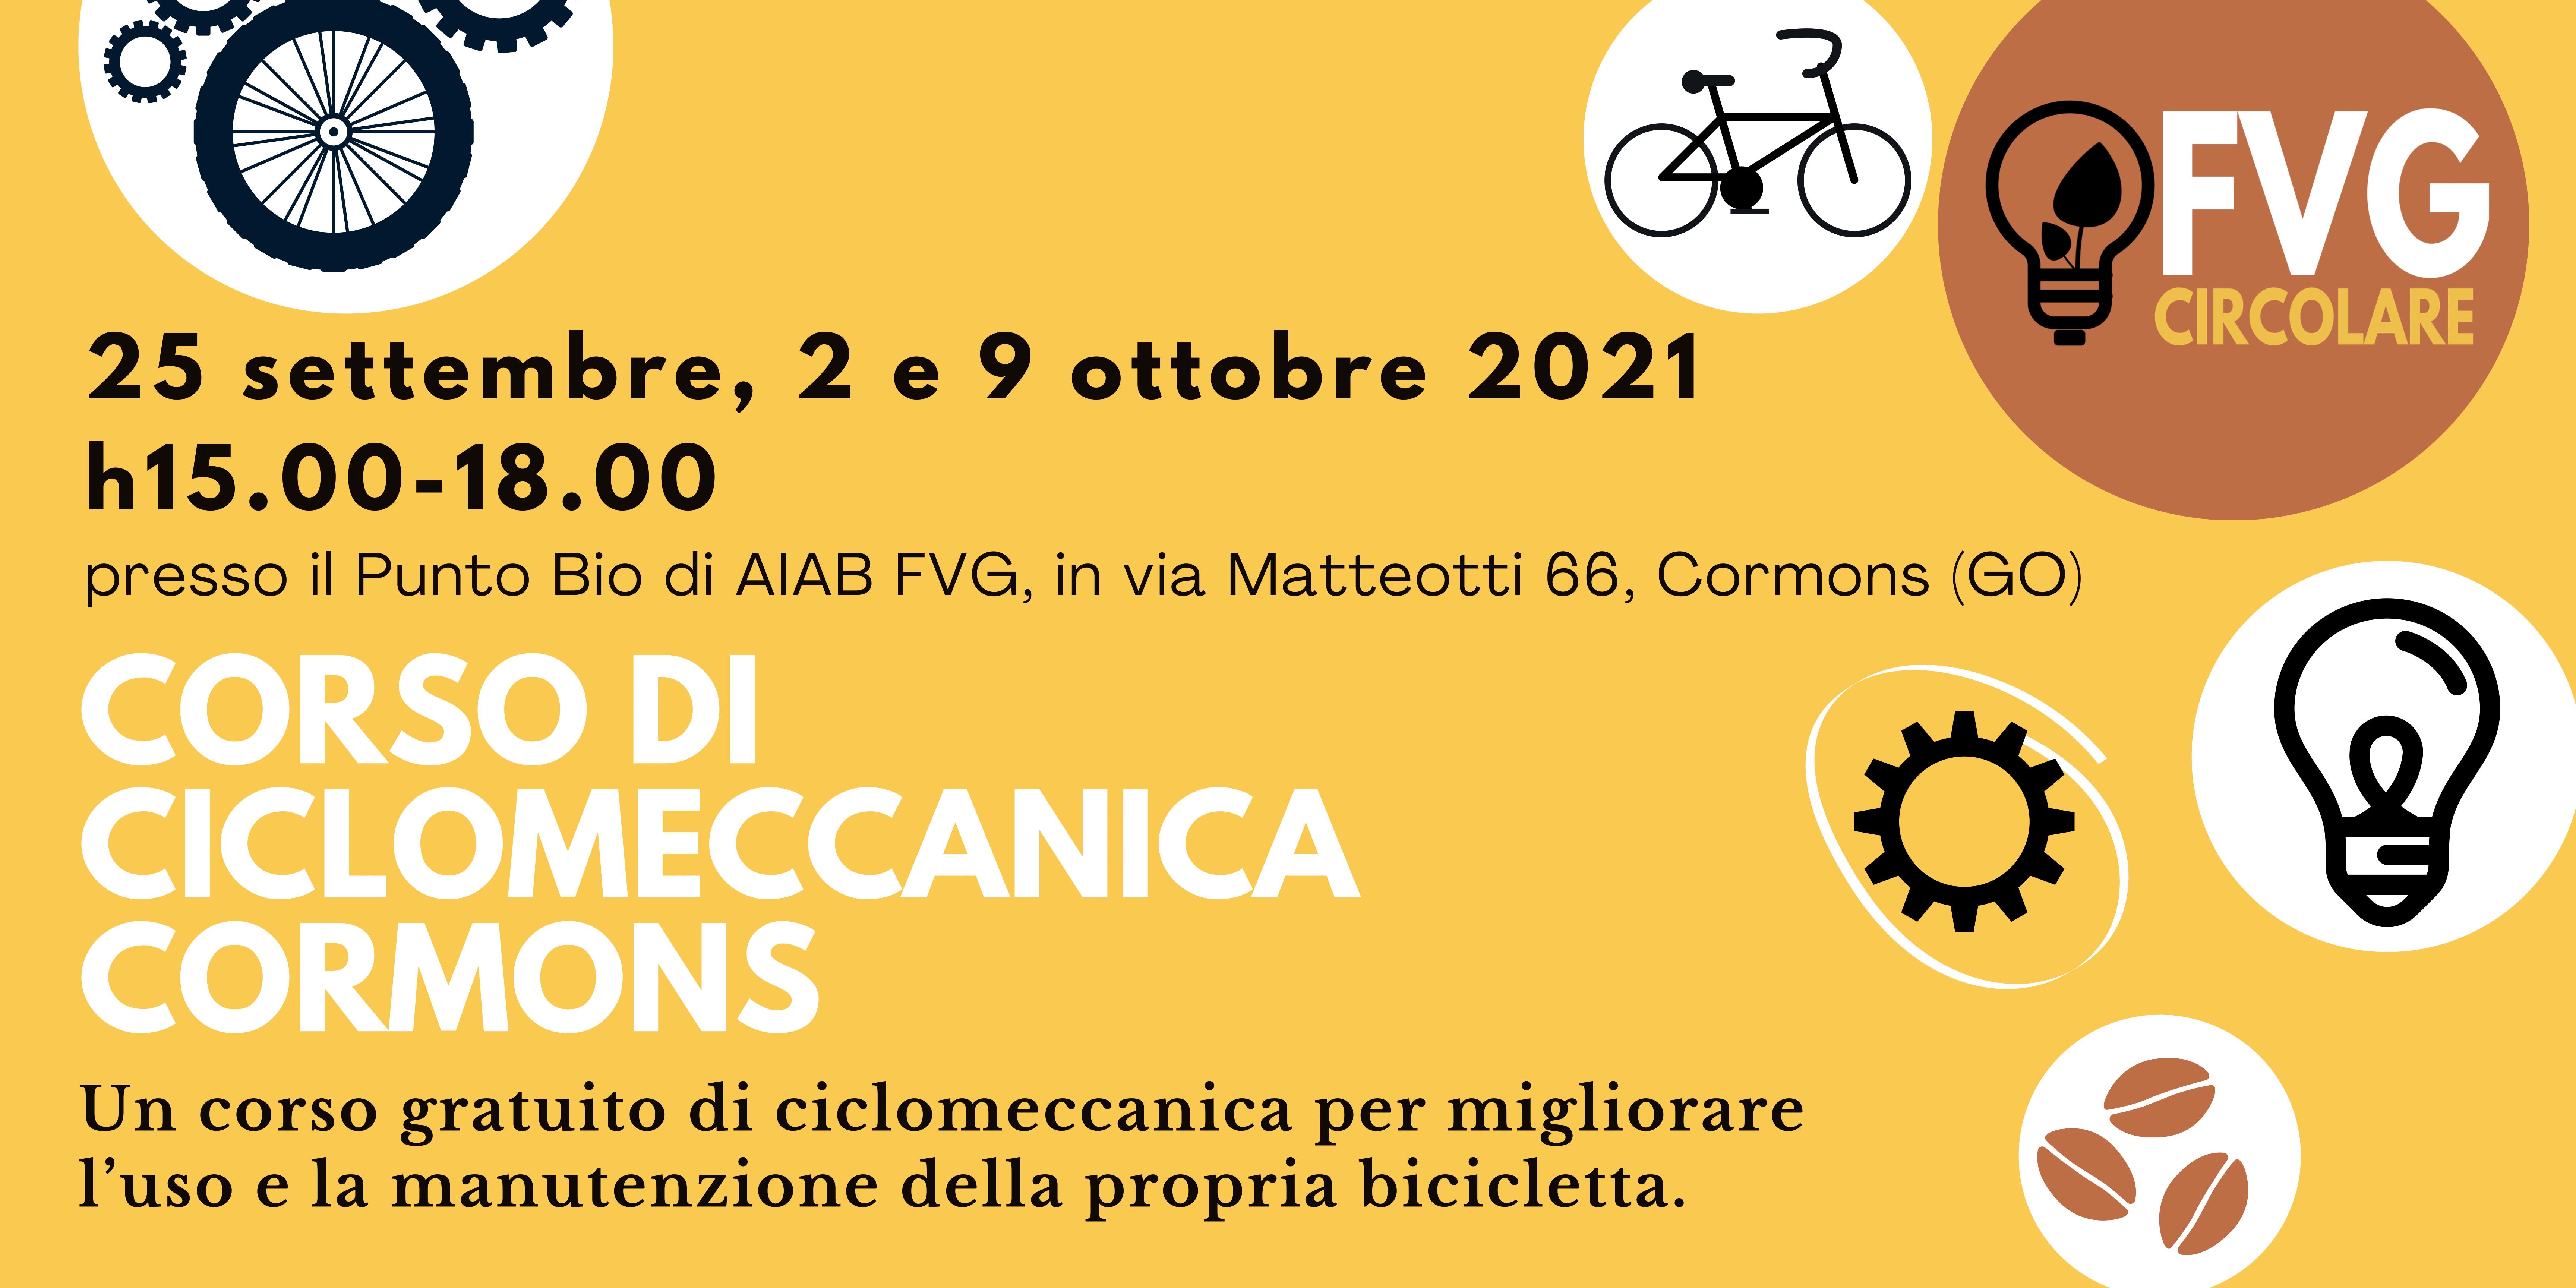 Corso ciclomeccanica a Cormons – FVG circolare